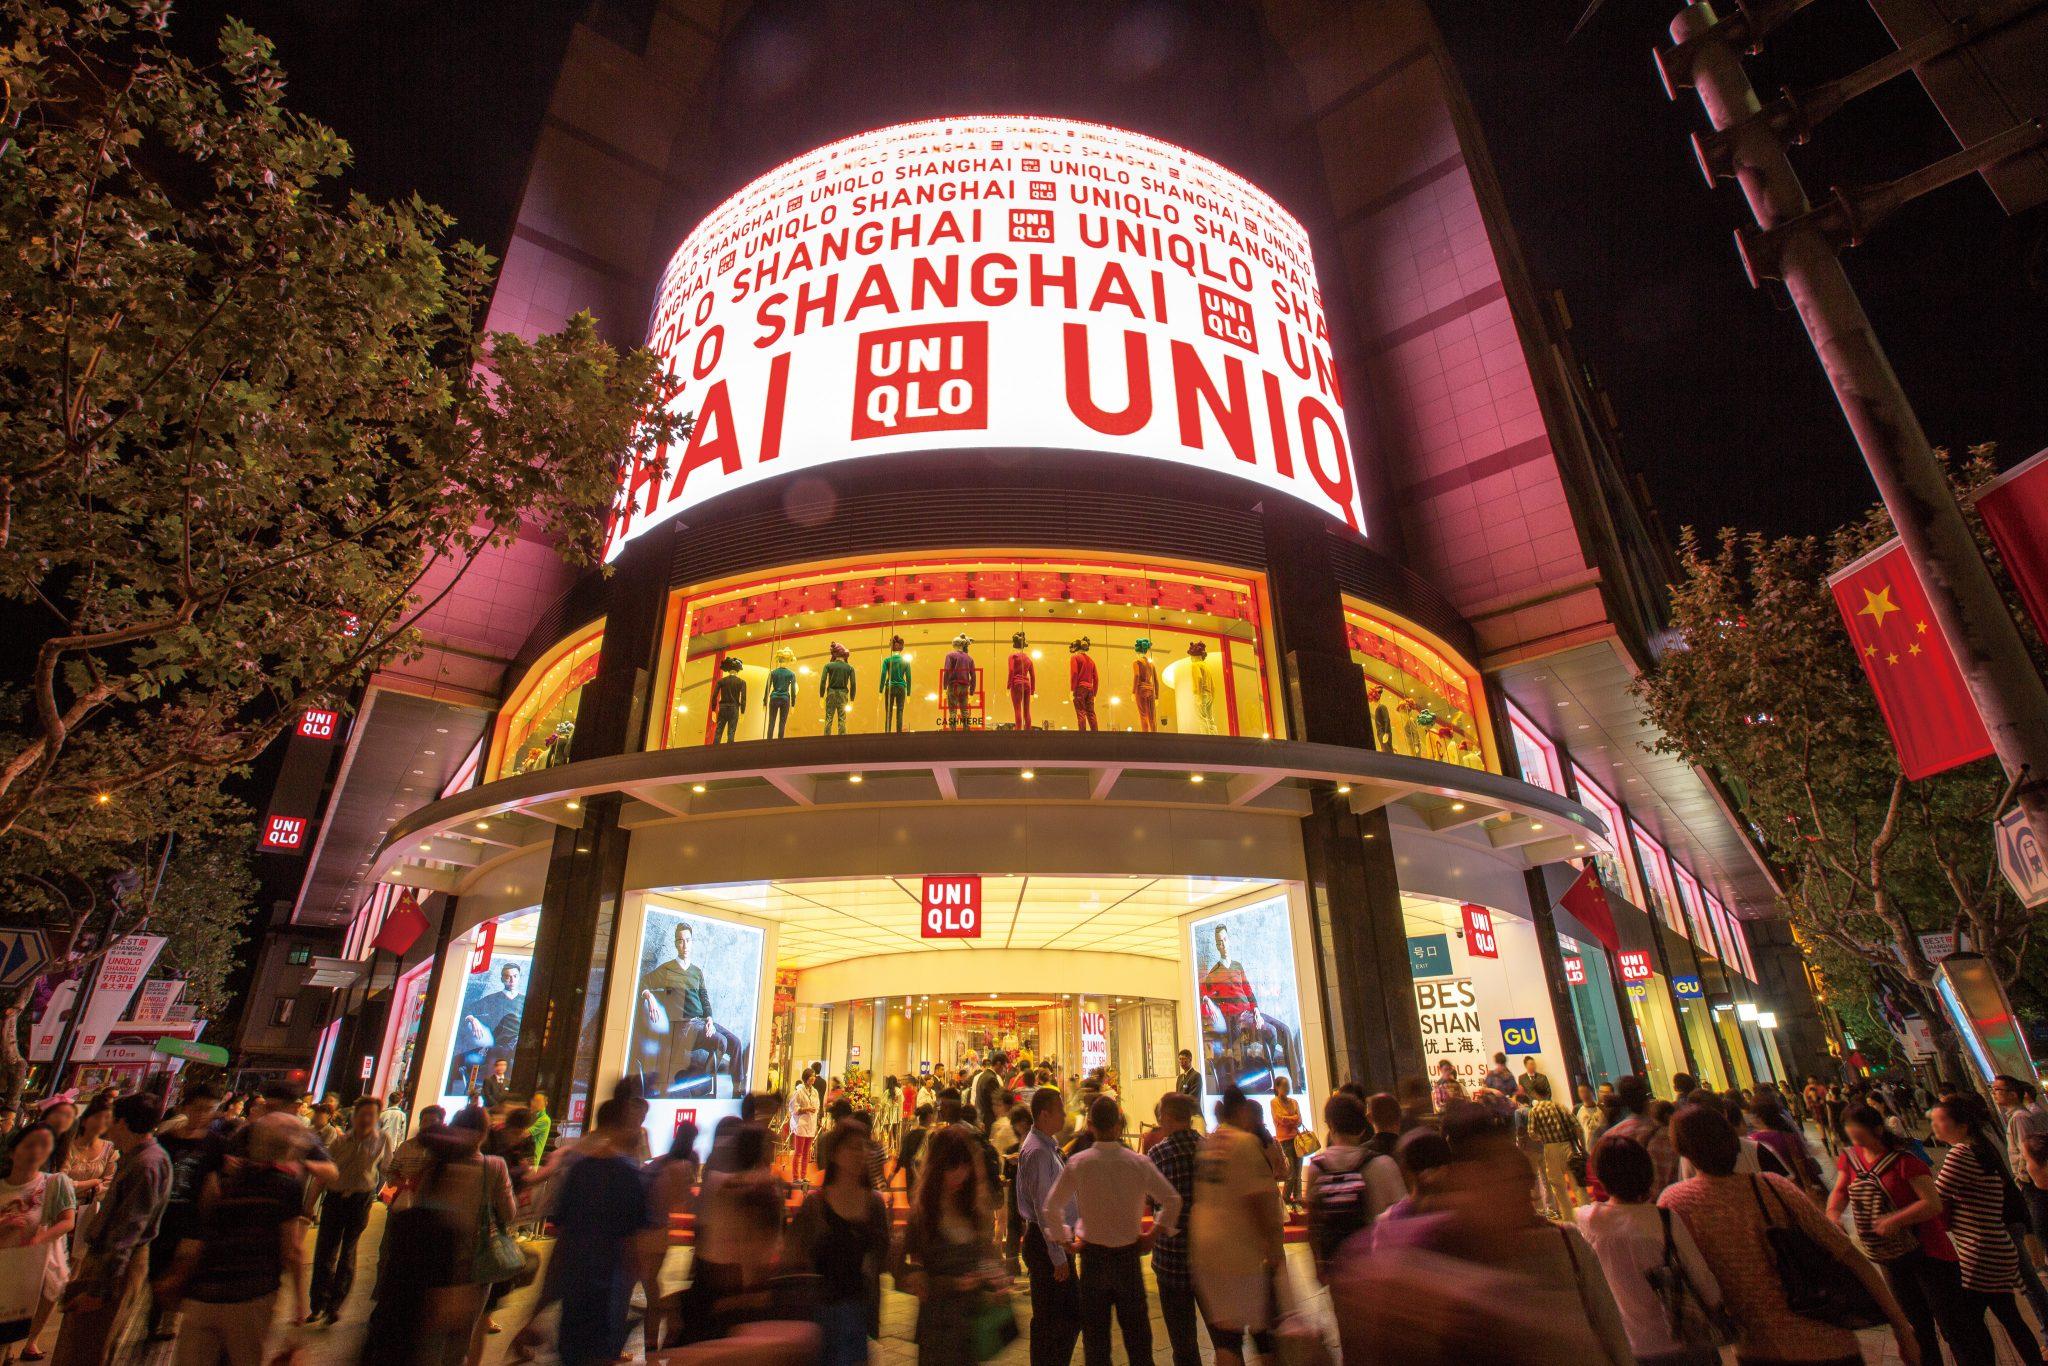 Uniqlo store in Shanghai